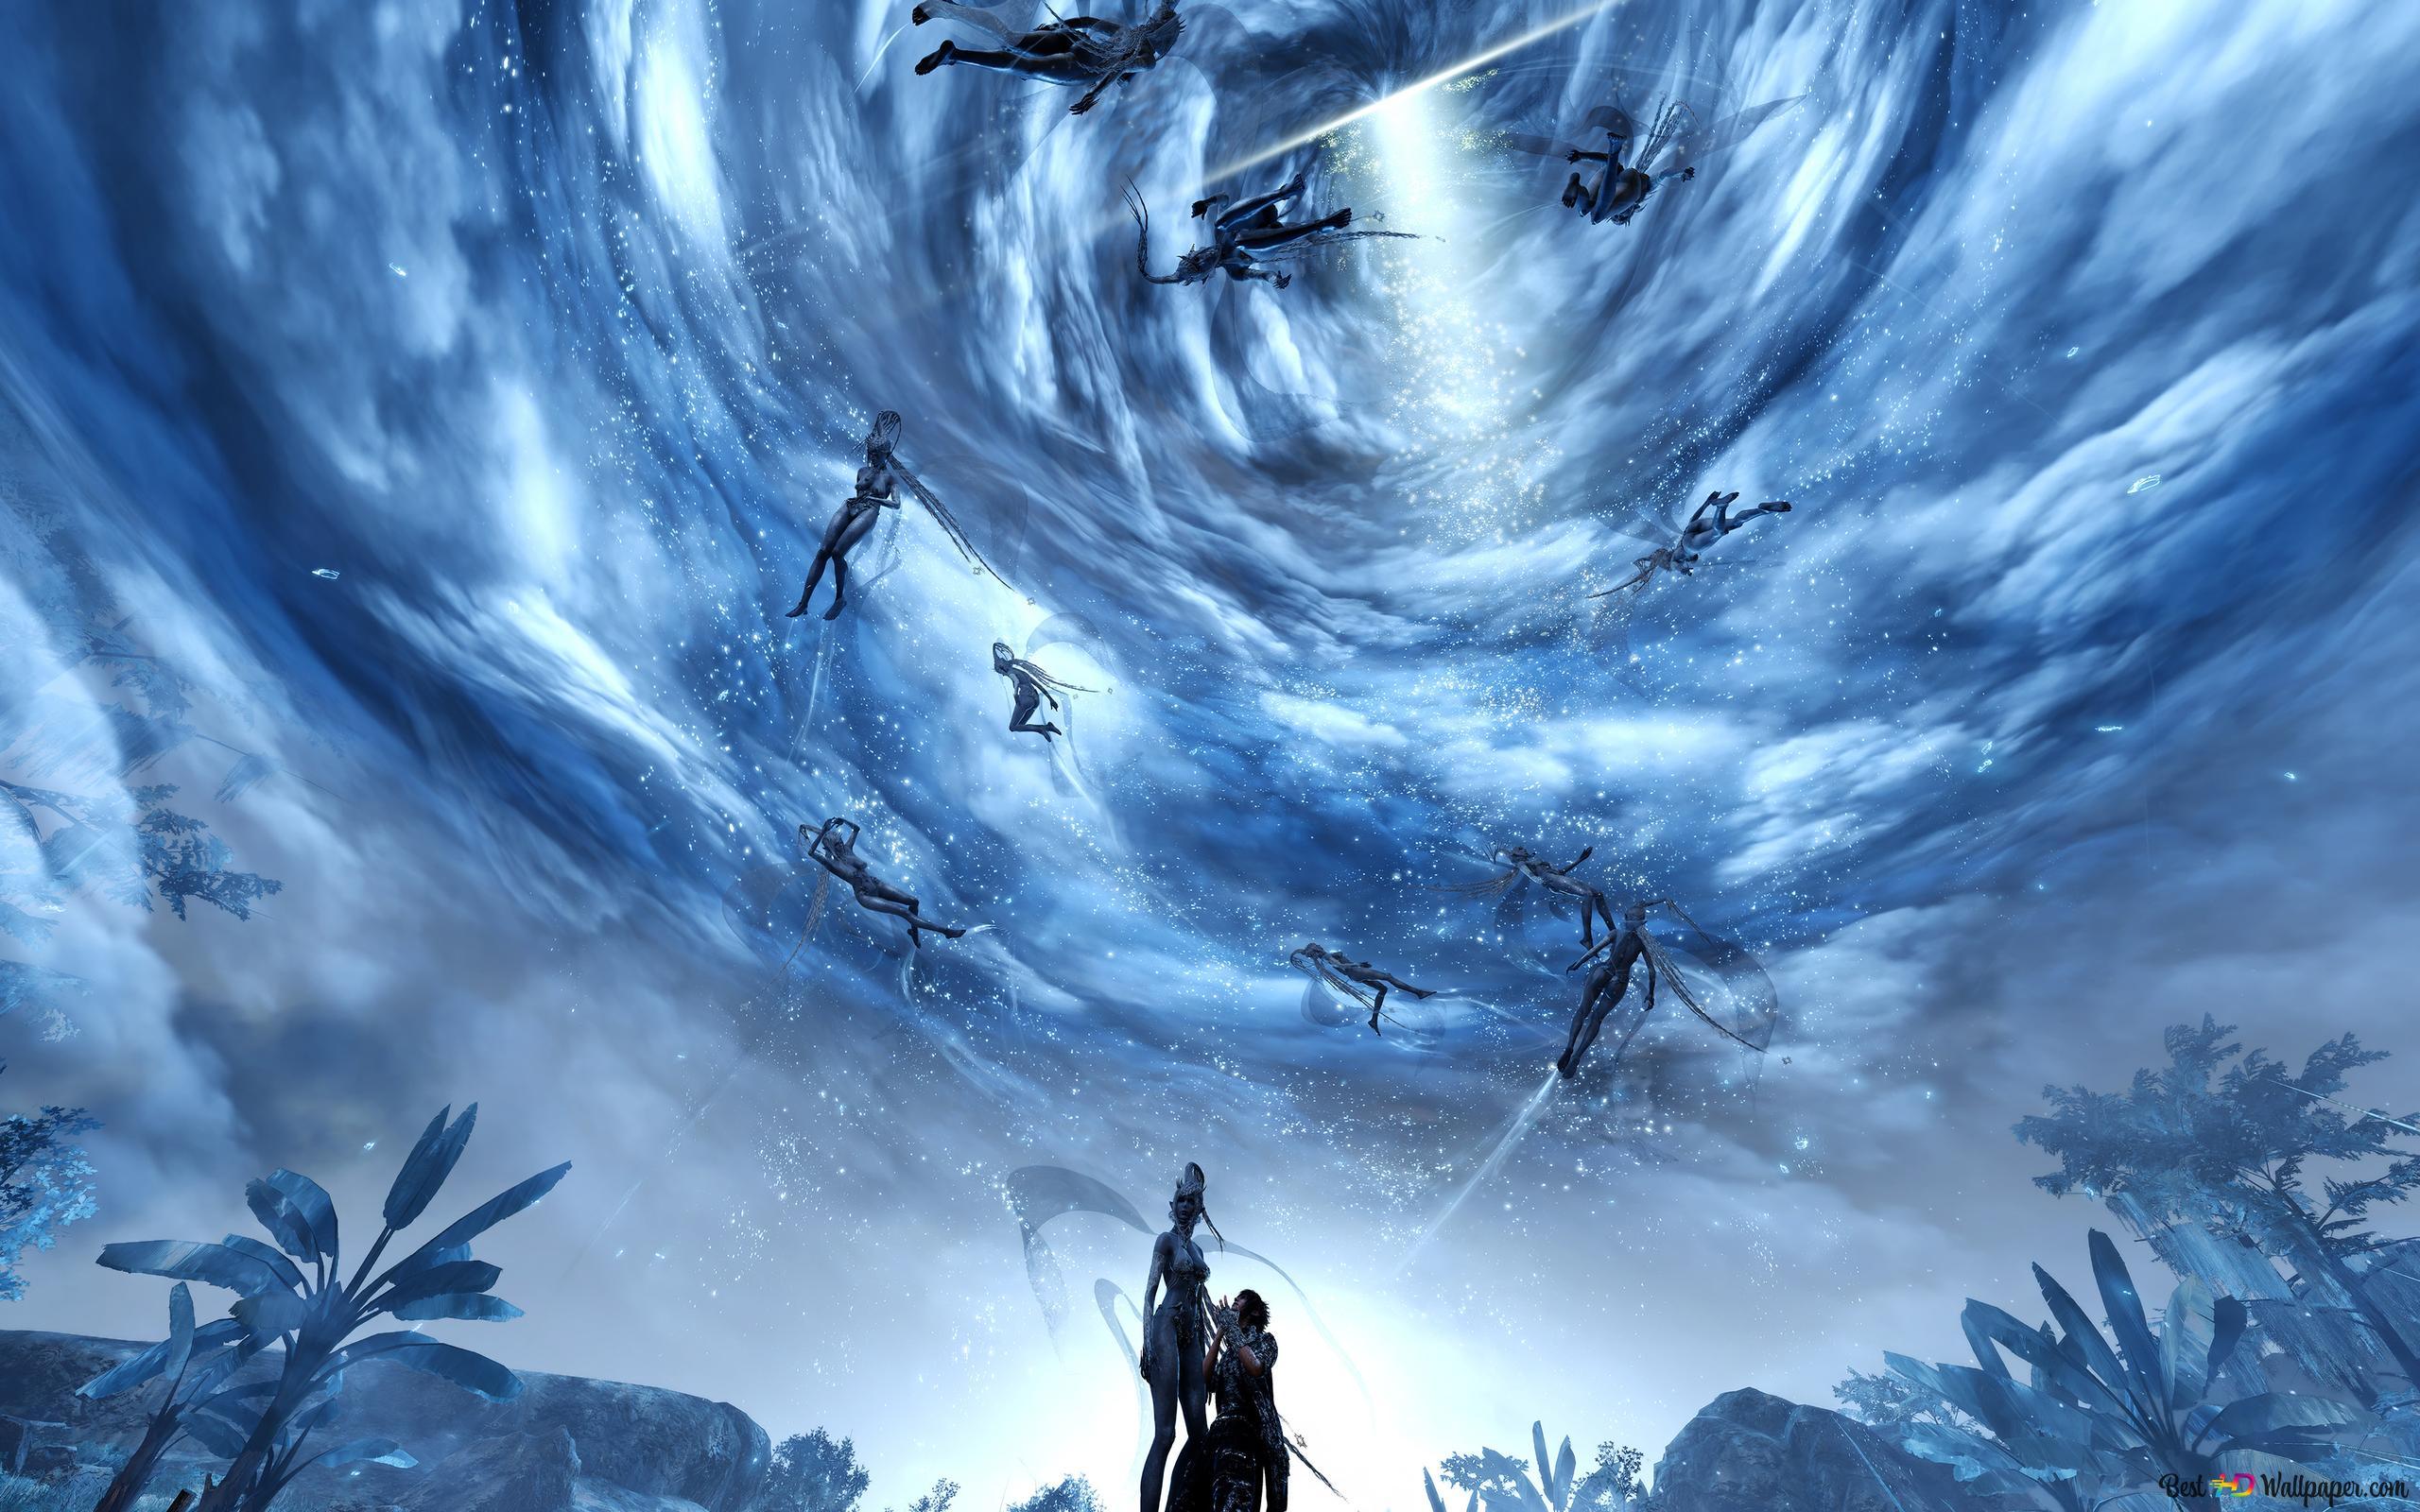 final fantasy xv aneh sky wallpaper 2560x1600 23479 7